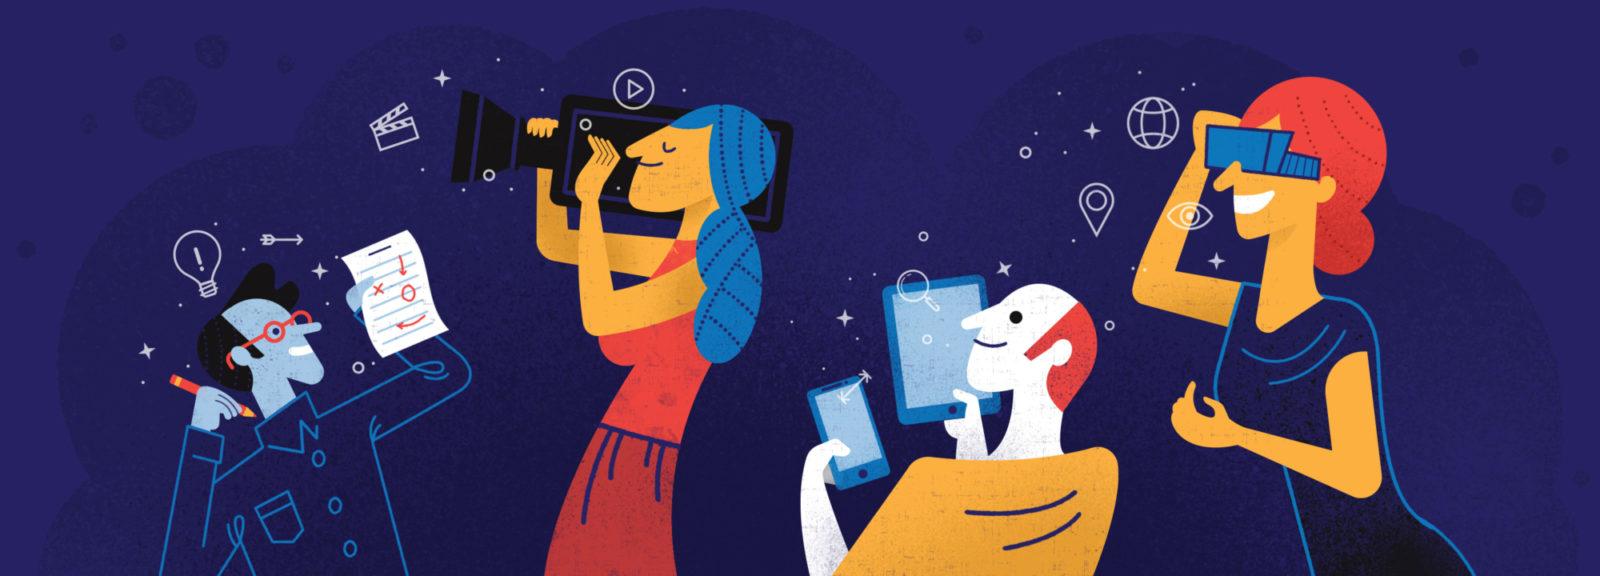 Services Hero Illustration